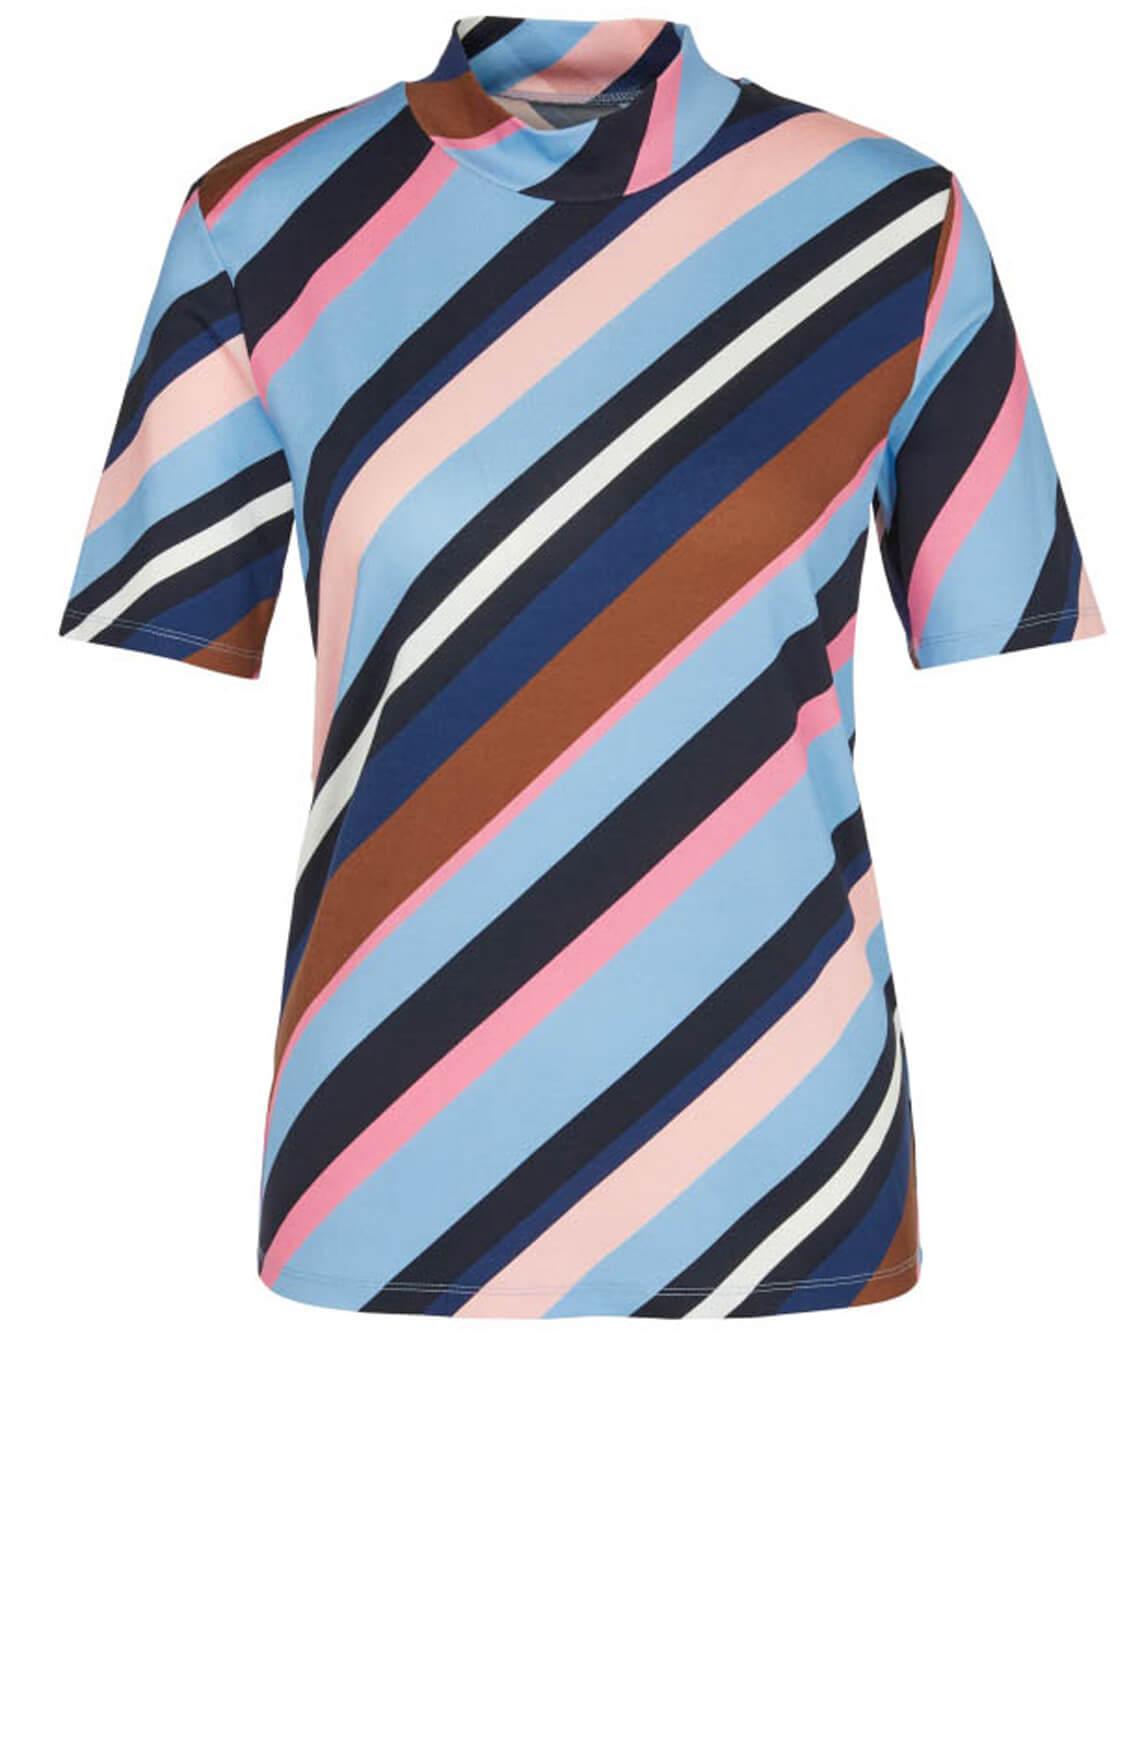 Marccain Dames Gestreept shirt Paars